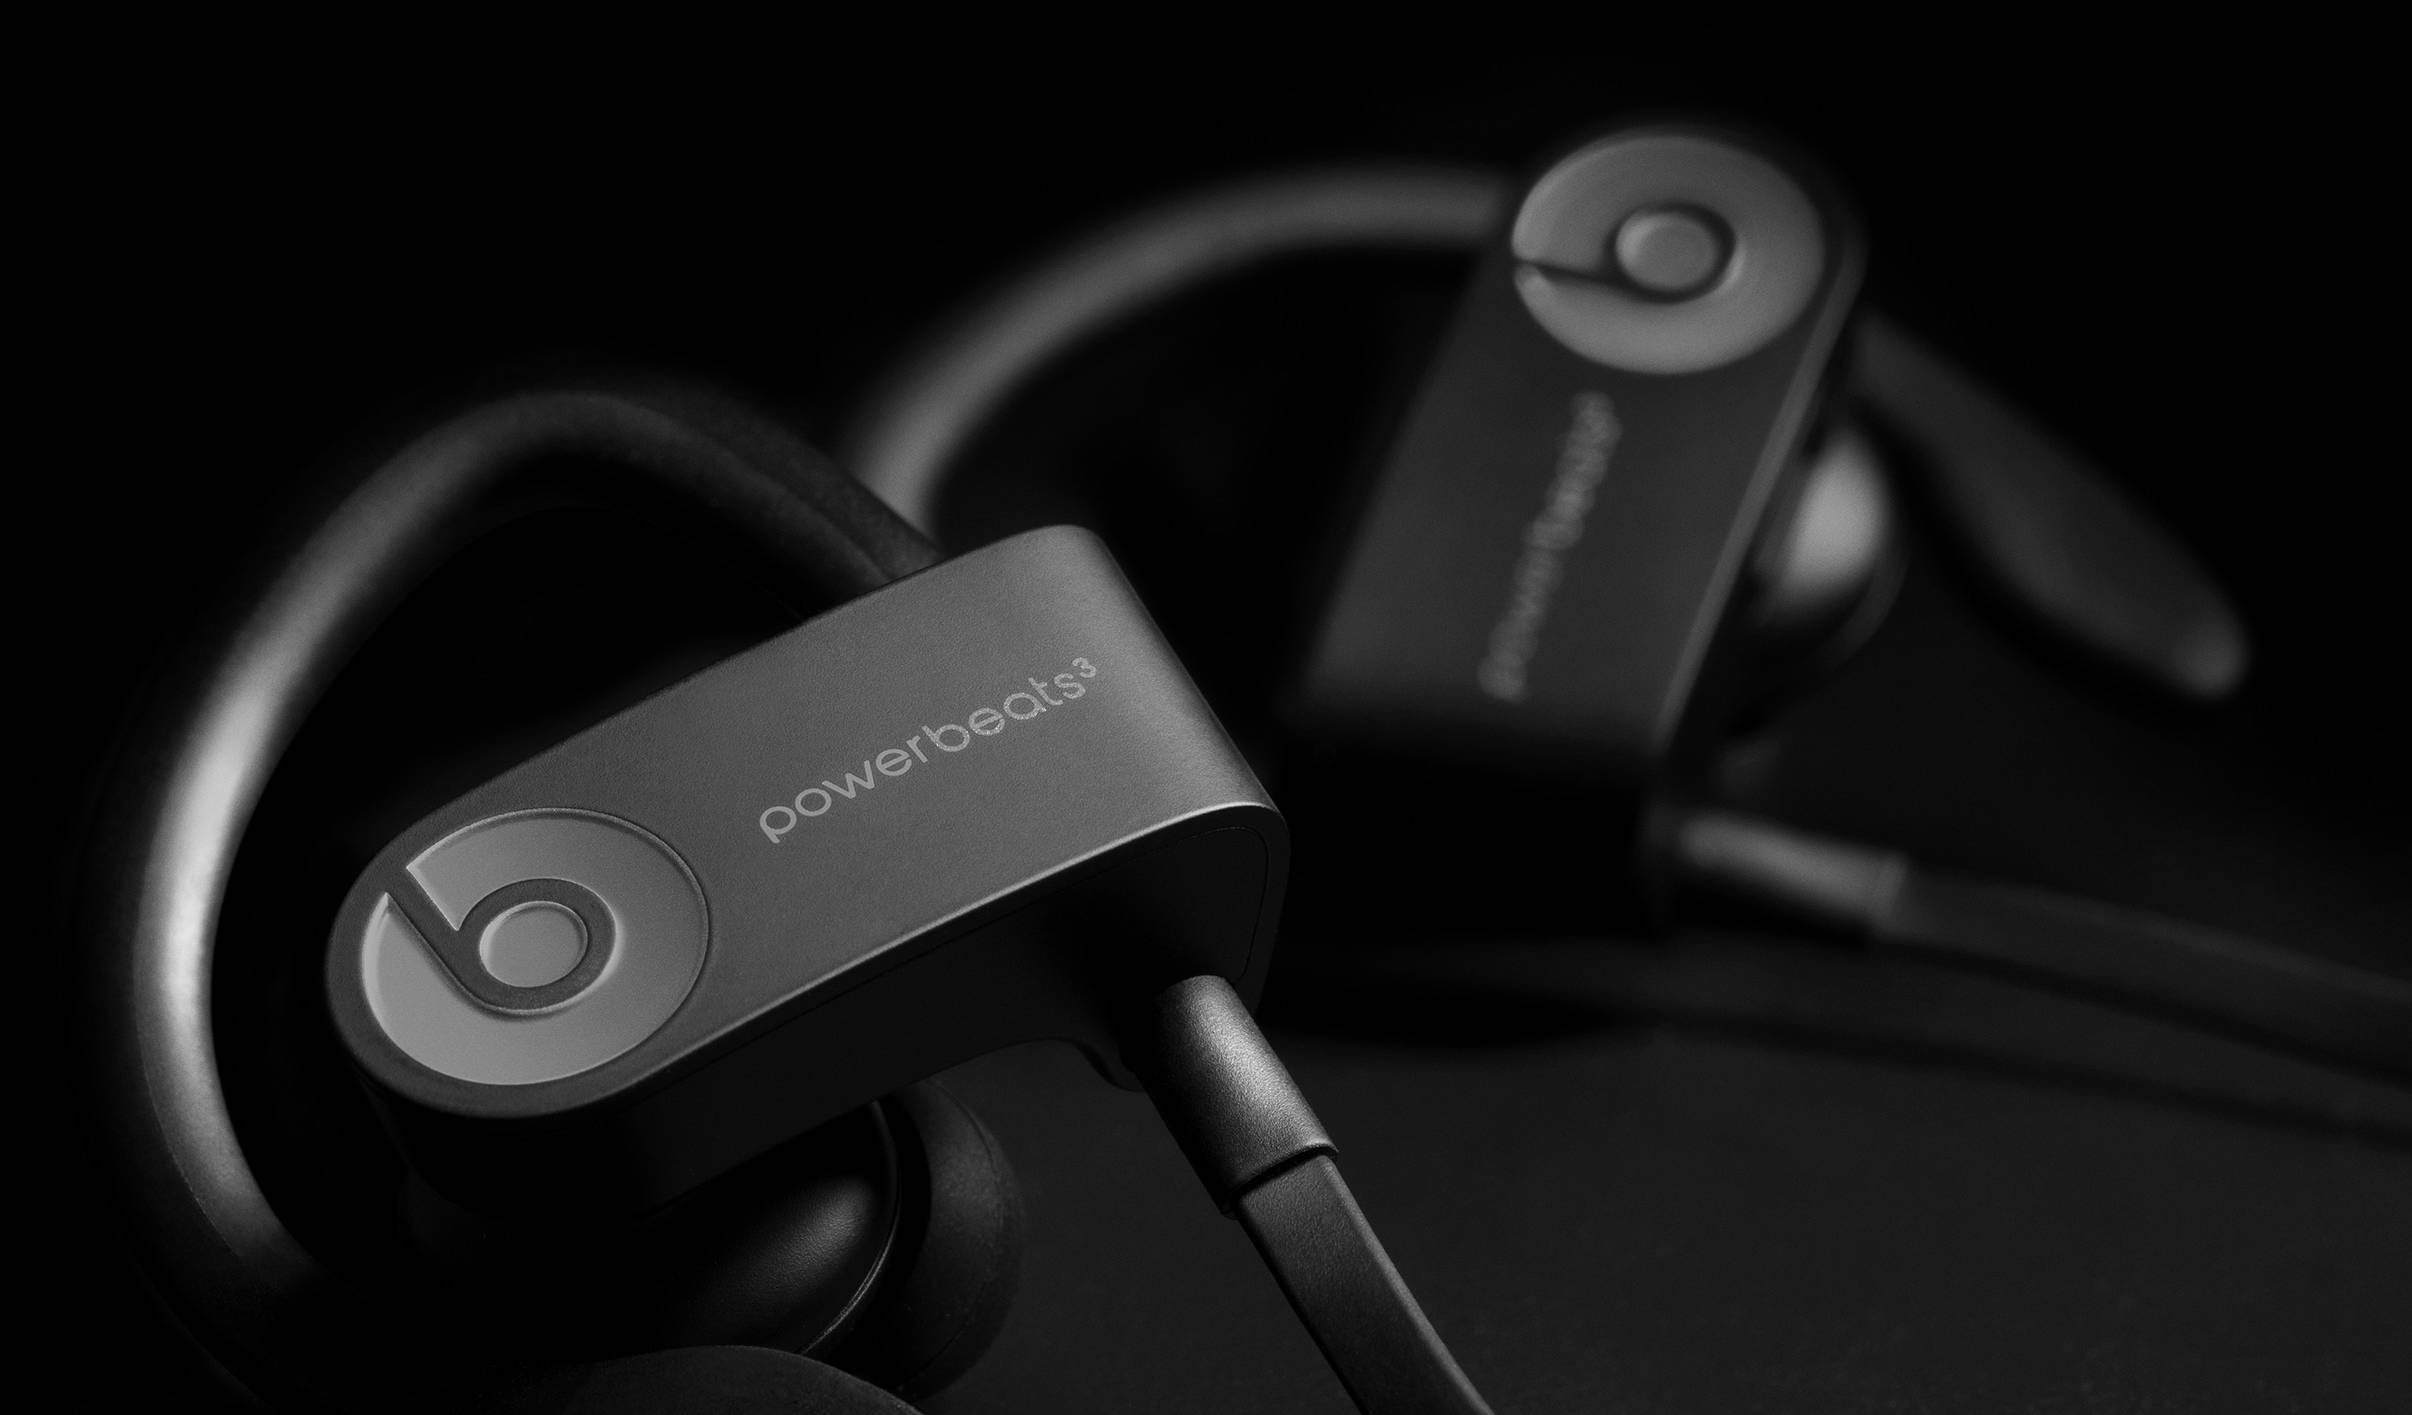 iOS 13.1 funkcja audio sharing Apple AirPods Beats BeatsX Powerbeats Pro jak podłączyć dwie pary słuchawek